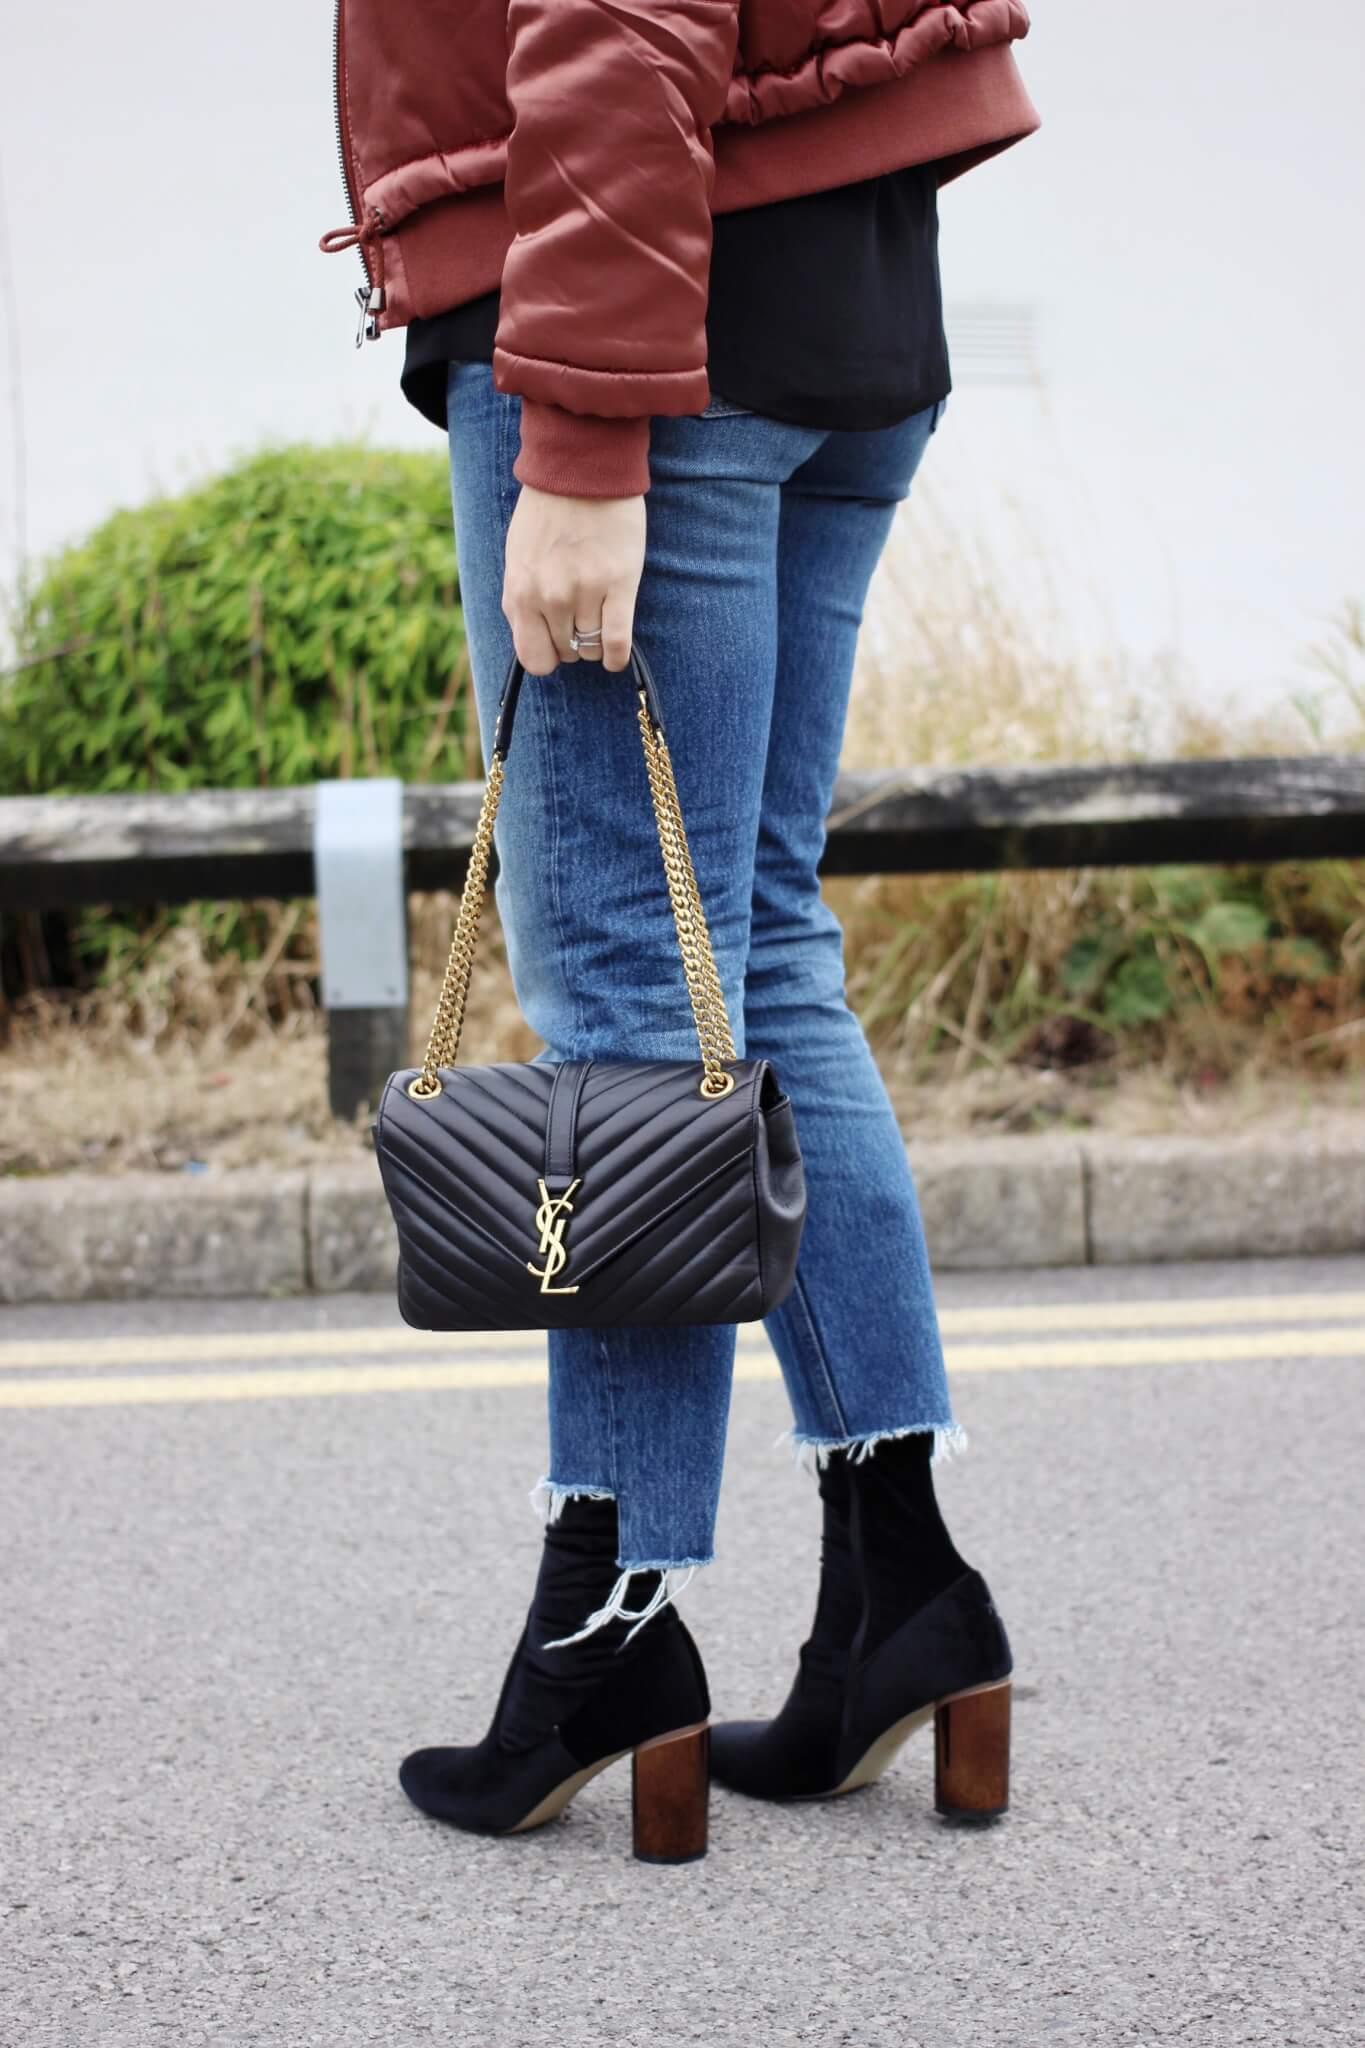 Saint Laurent Handbags for Autumn